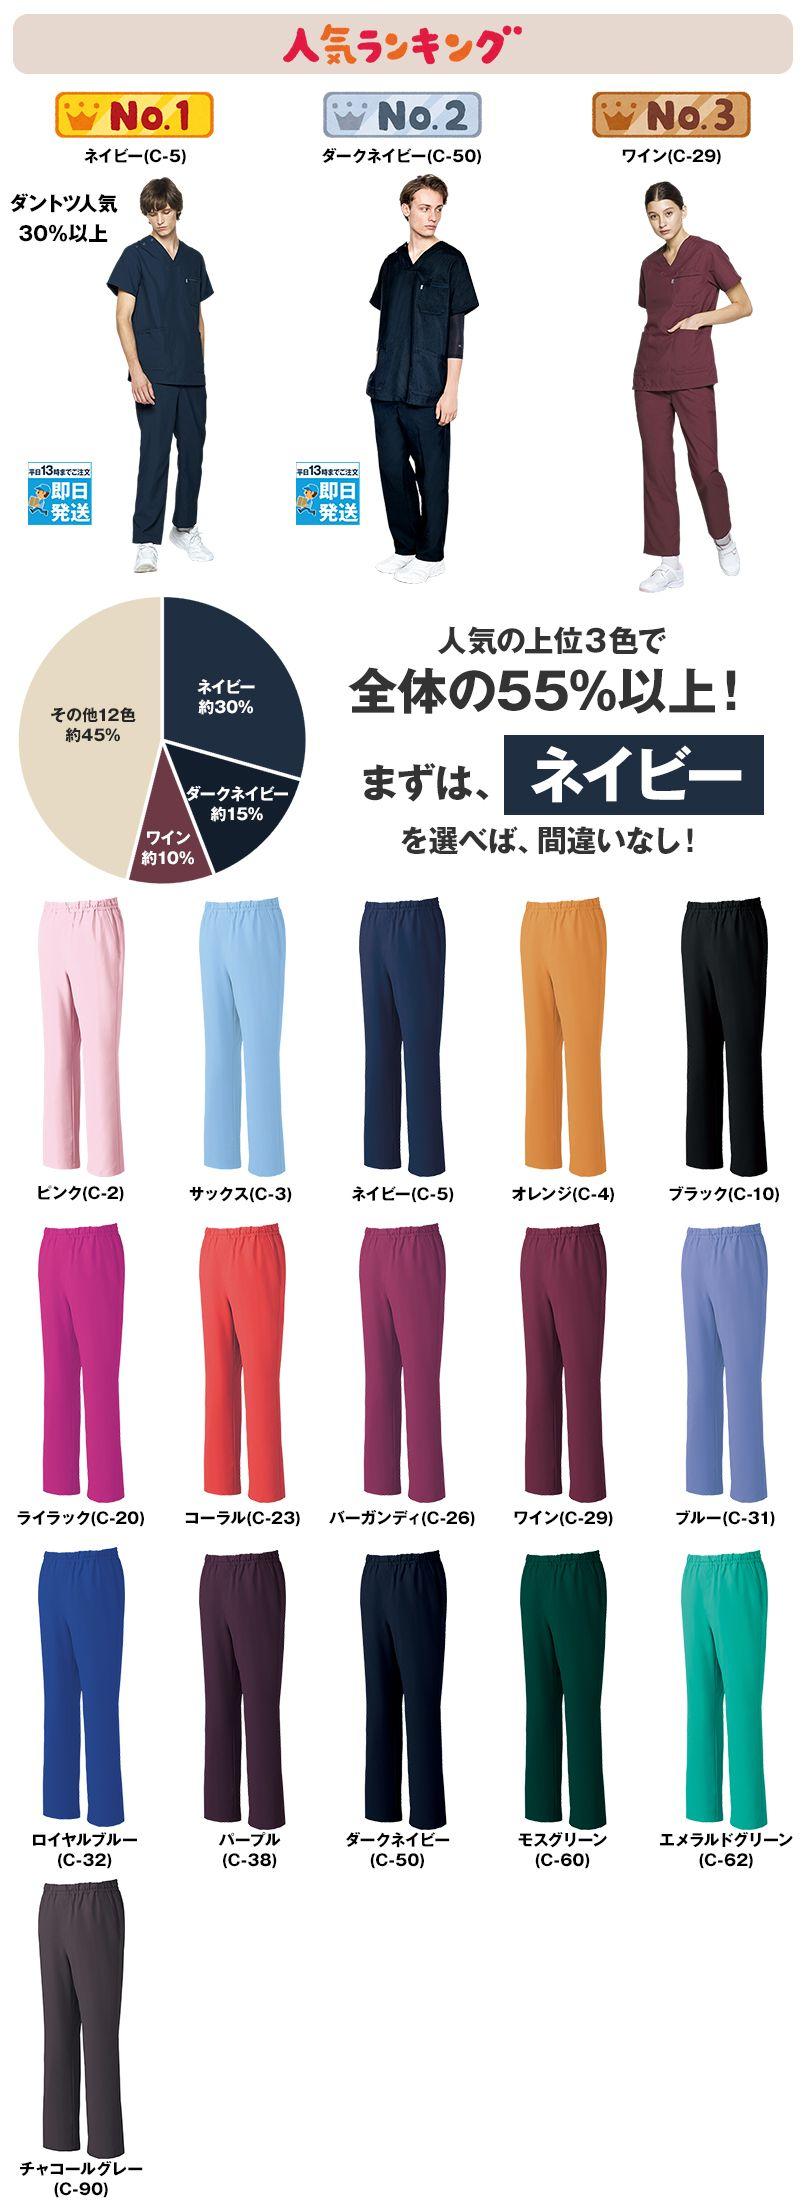 MZ-0019 ミズノ(mizuno) スクラブパンツ(男女兼用)股下マチ 色展開